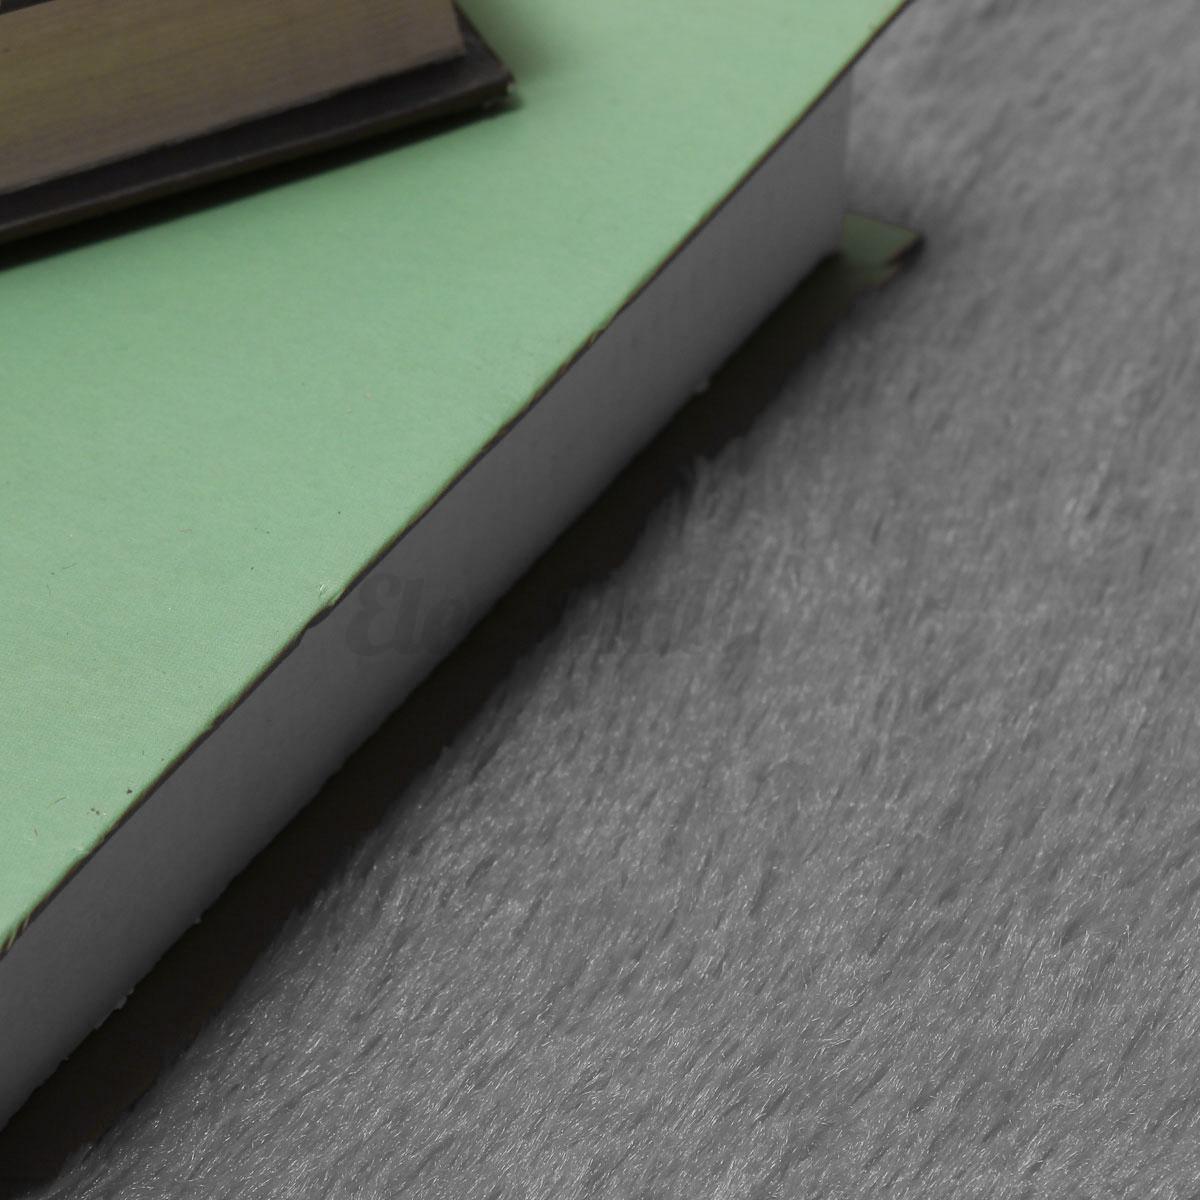 120cm round fluffy rug anti skid shaggy rug - Dining Room Floor Mat